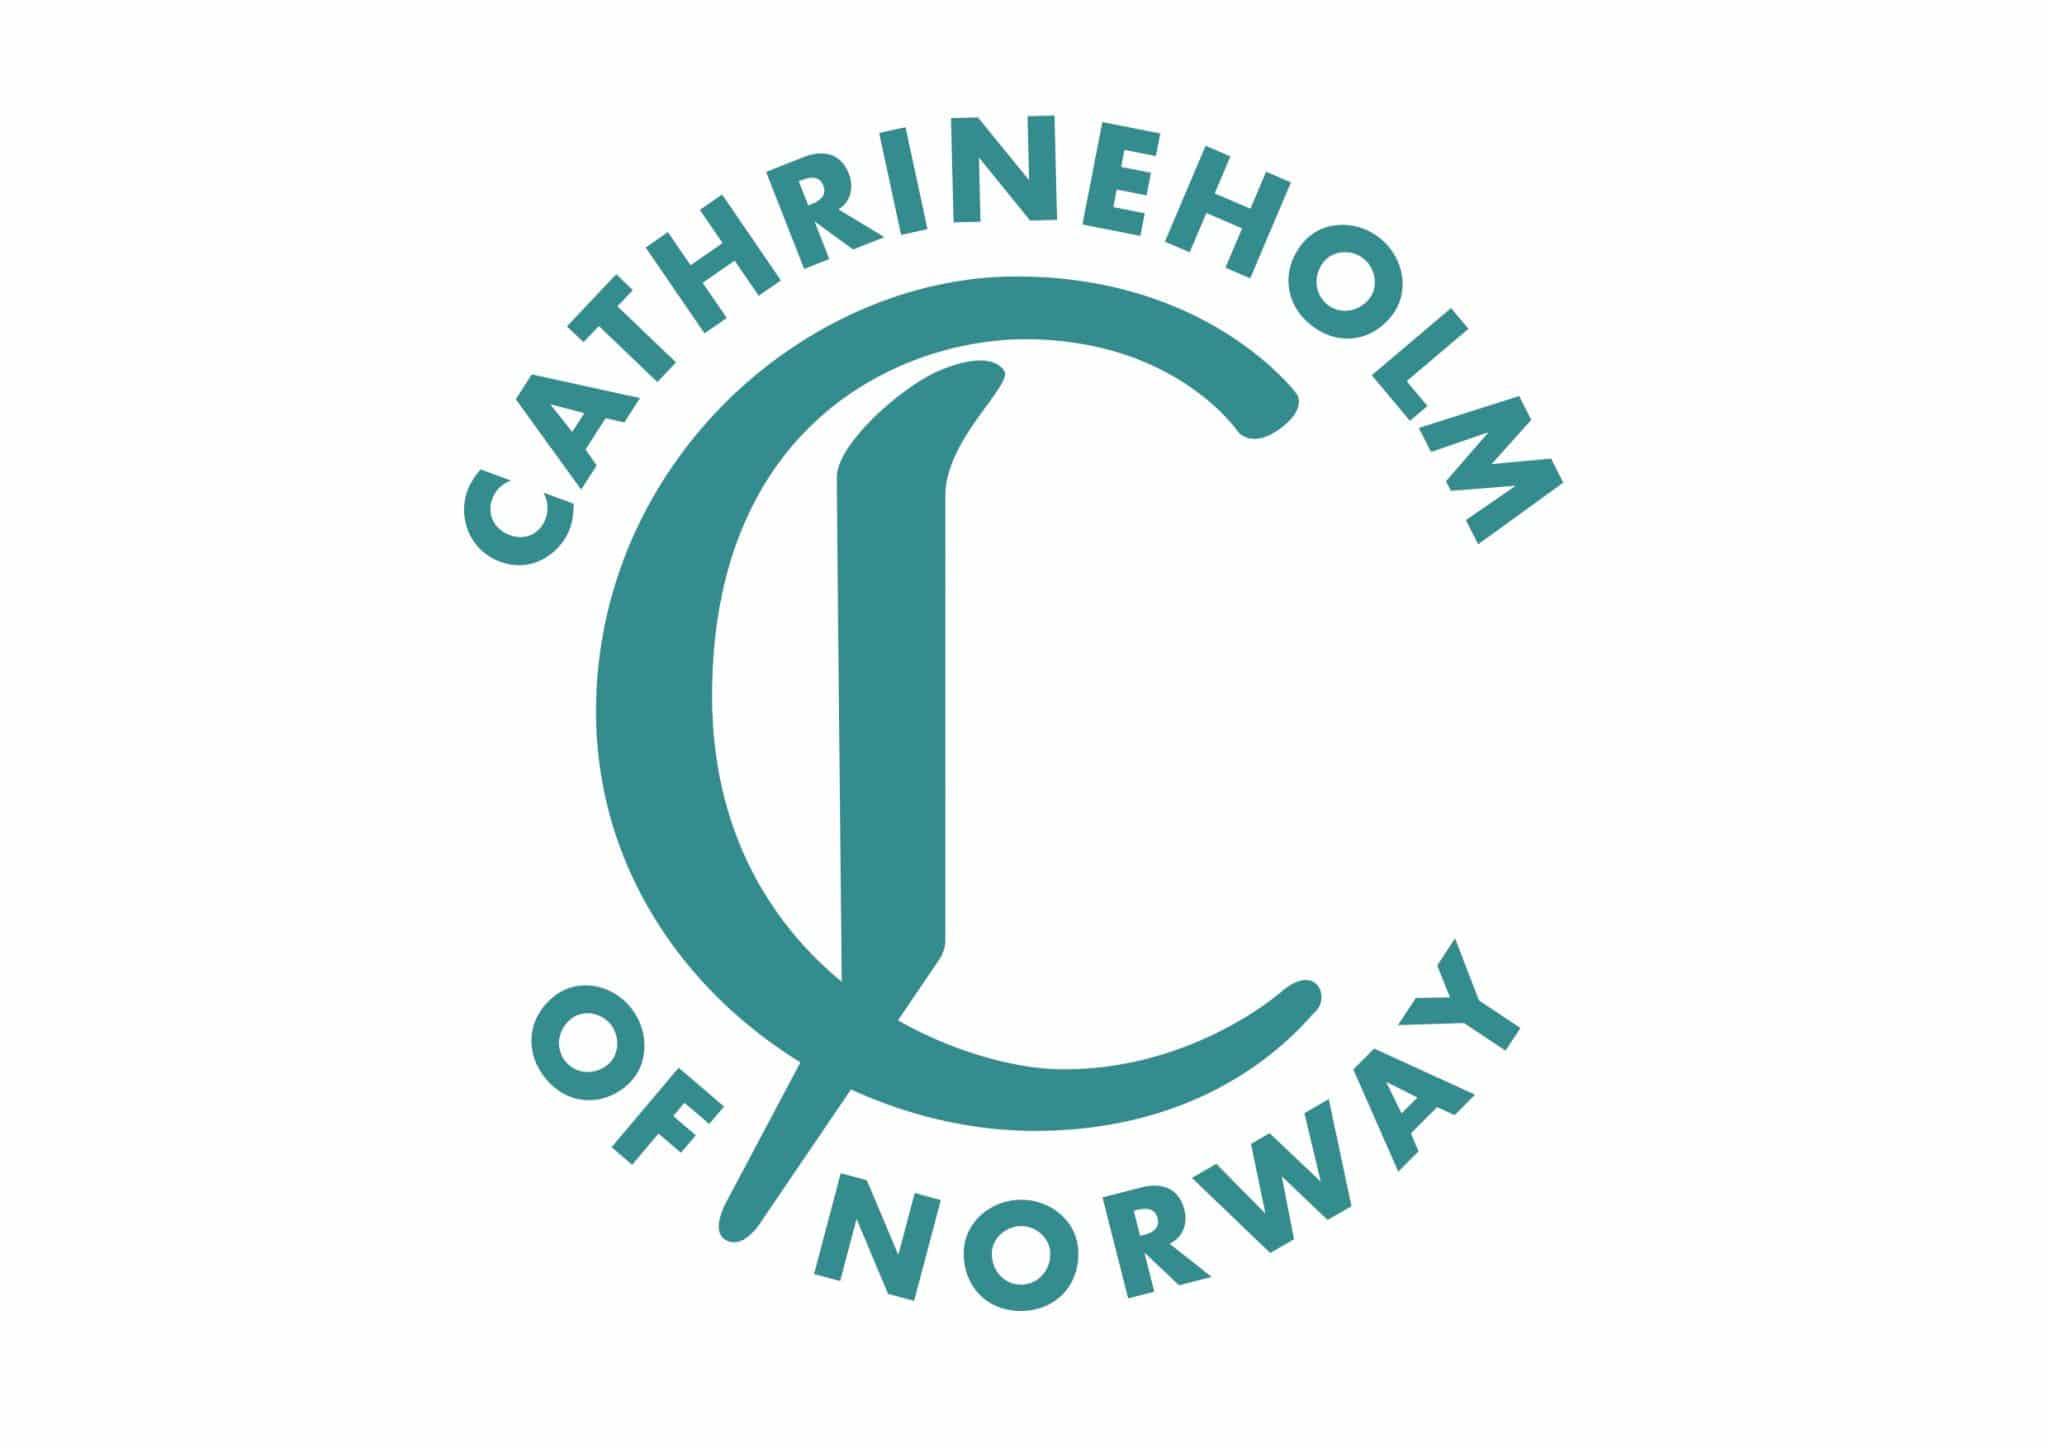 Cathrine Holm